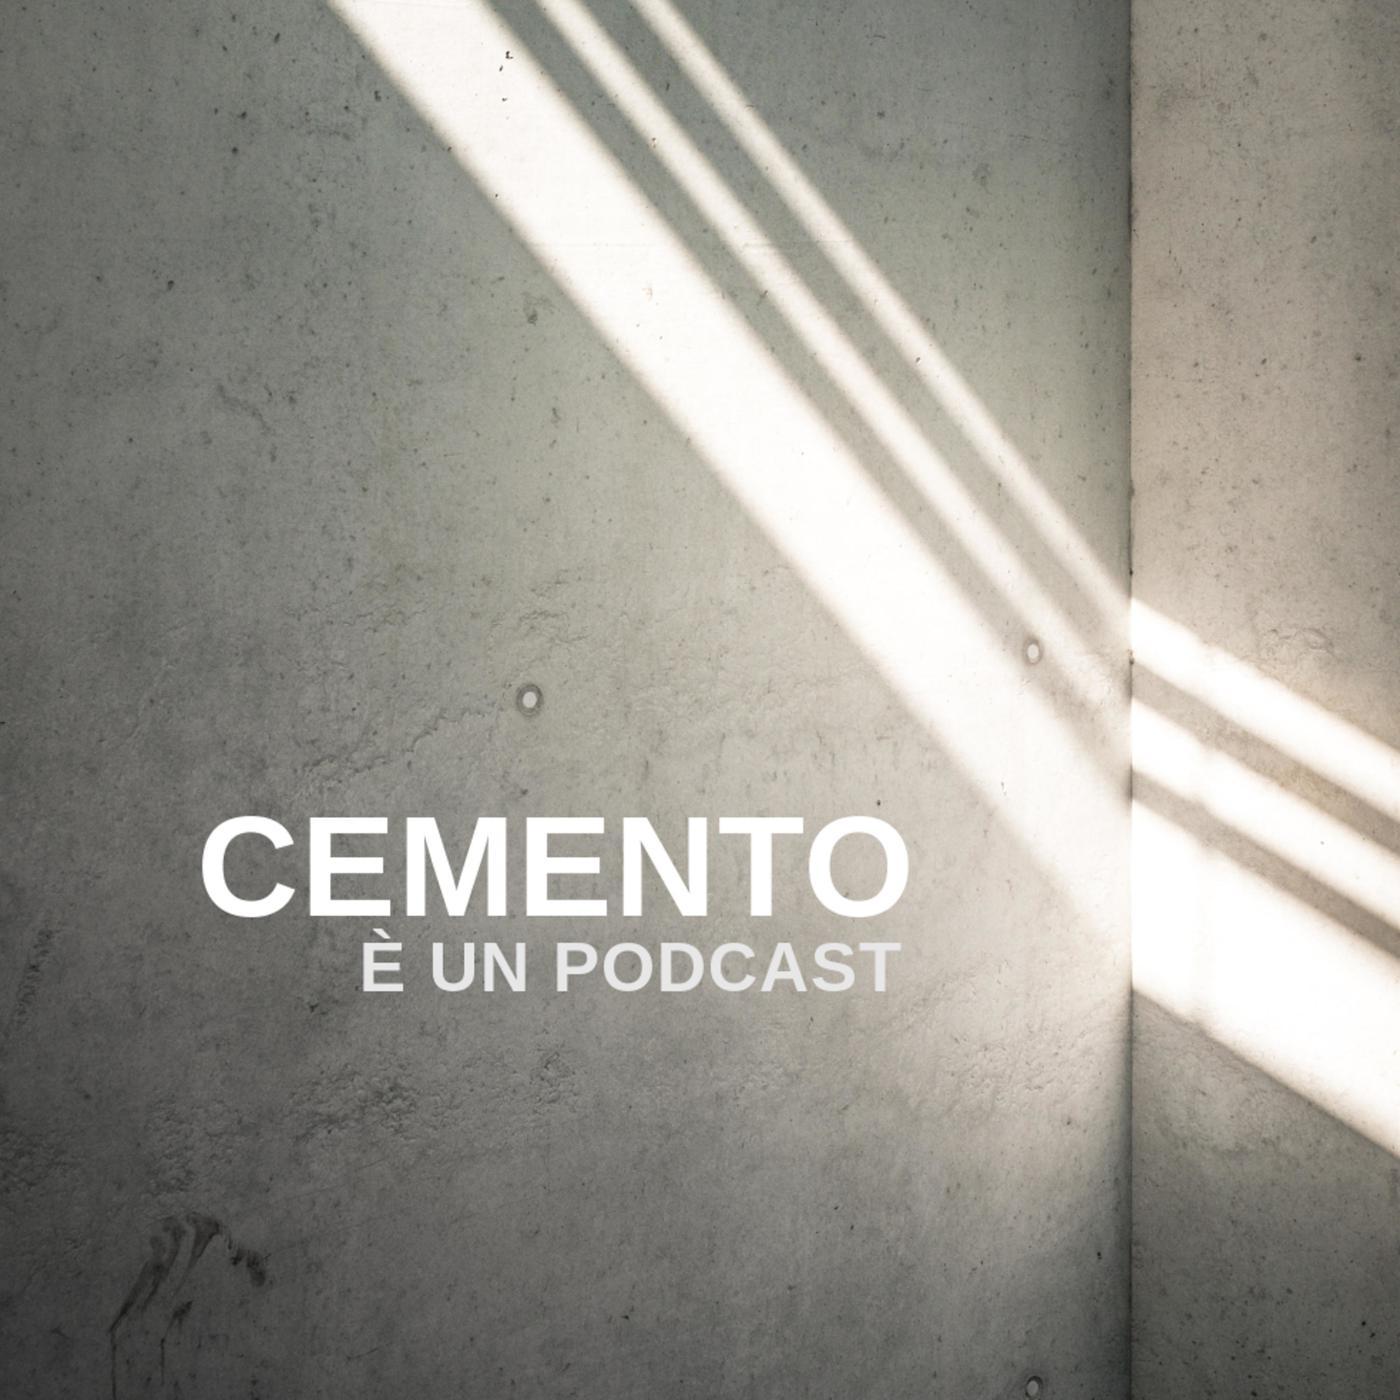 cemento podcast